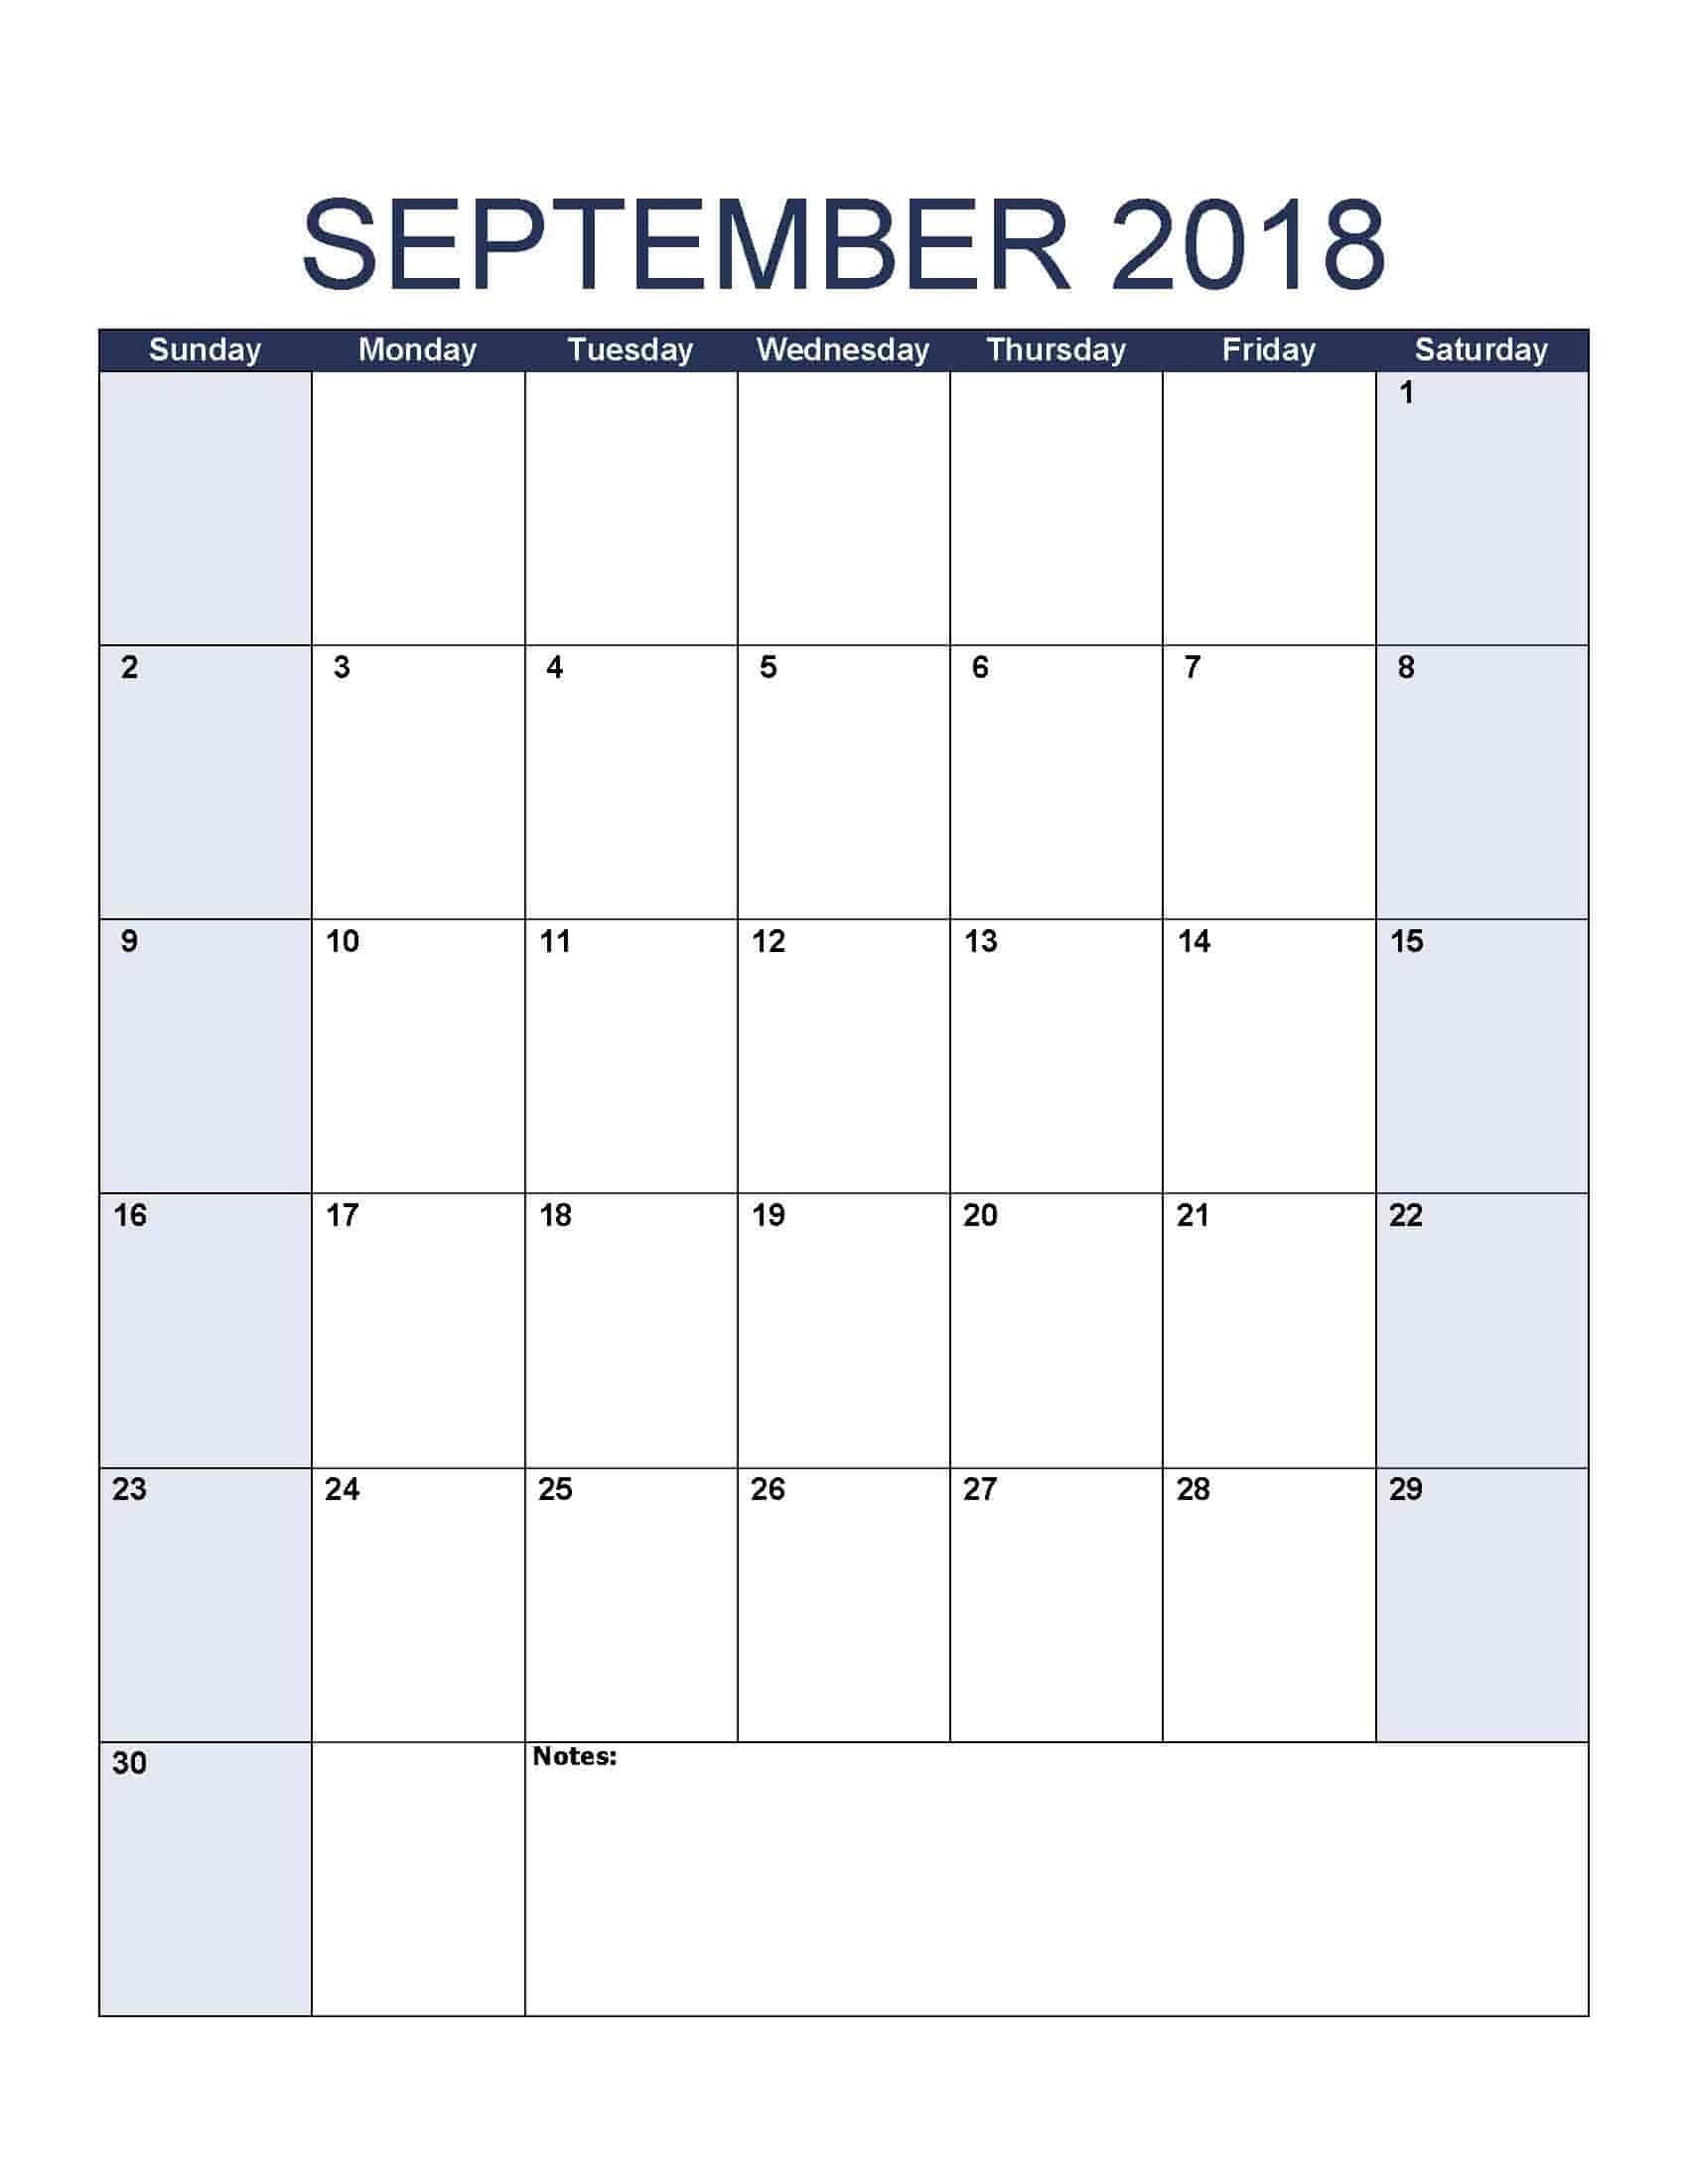 September 2018 Calendar - Free, Printable Calendar Templates-Blank Printable Catholic Calender September